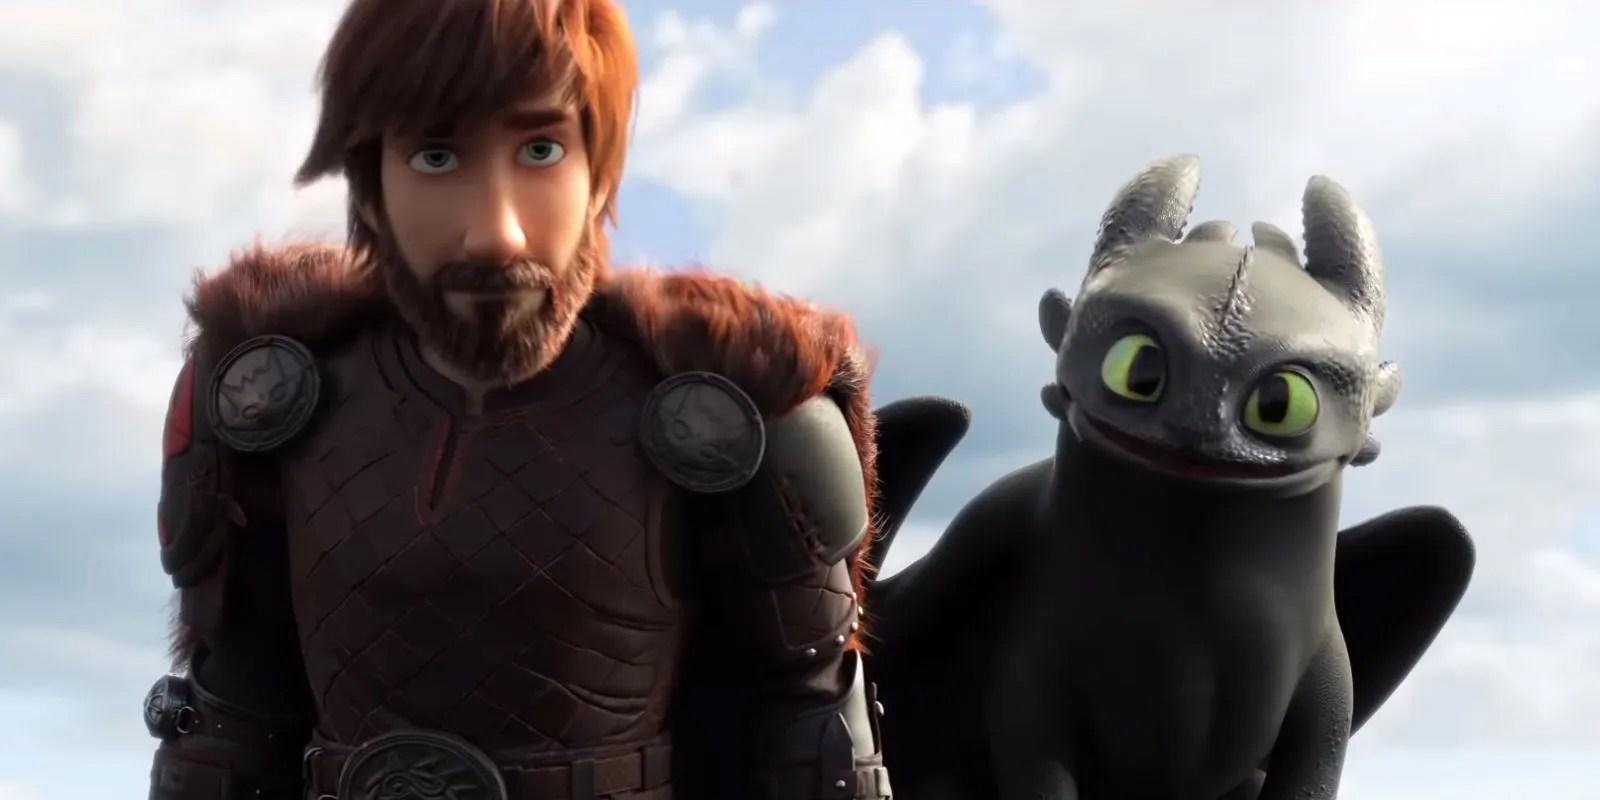 How to Train Your Dragon 3 Interview: Director Dean DeBlois